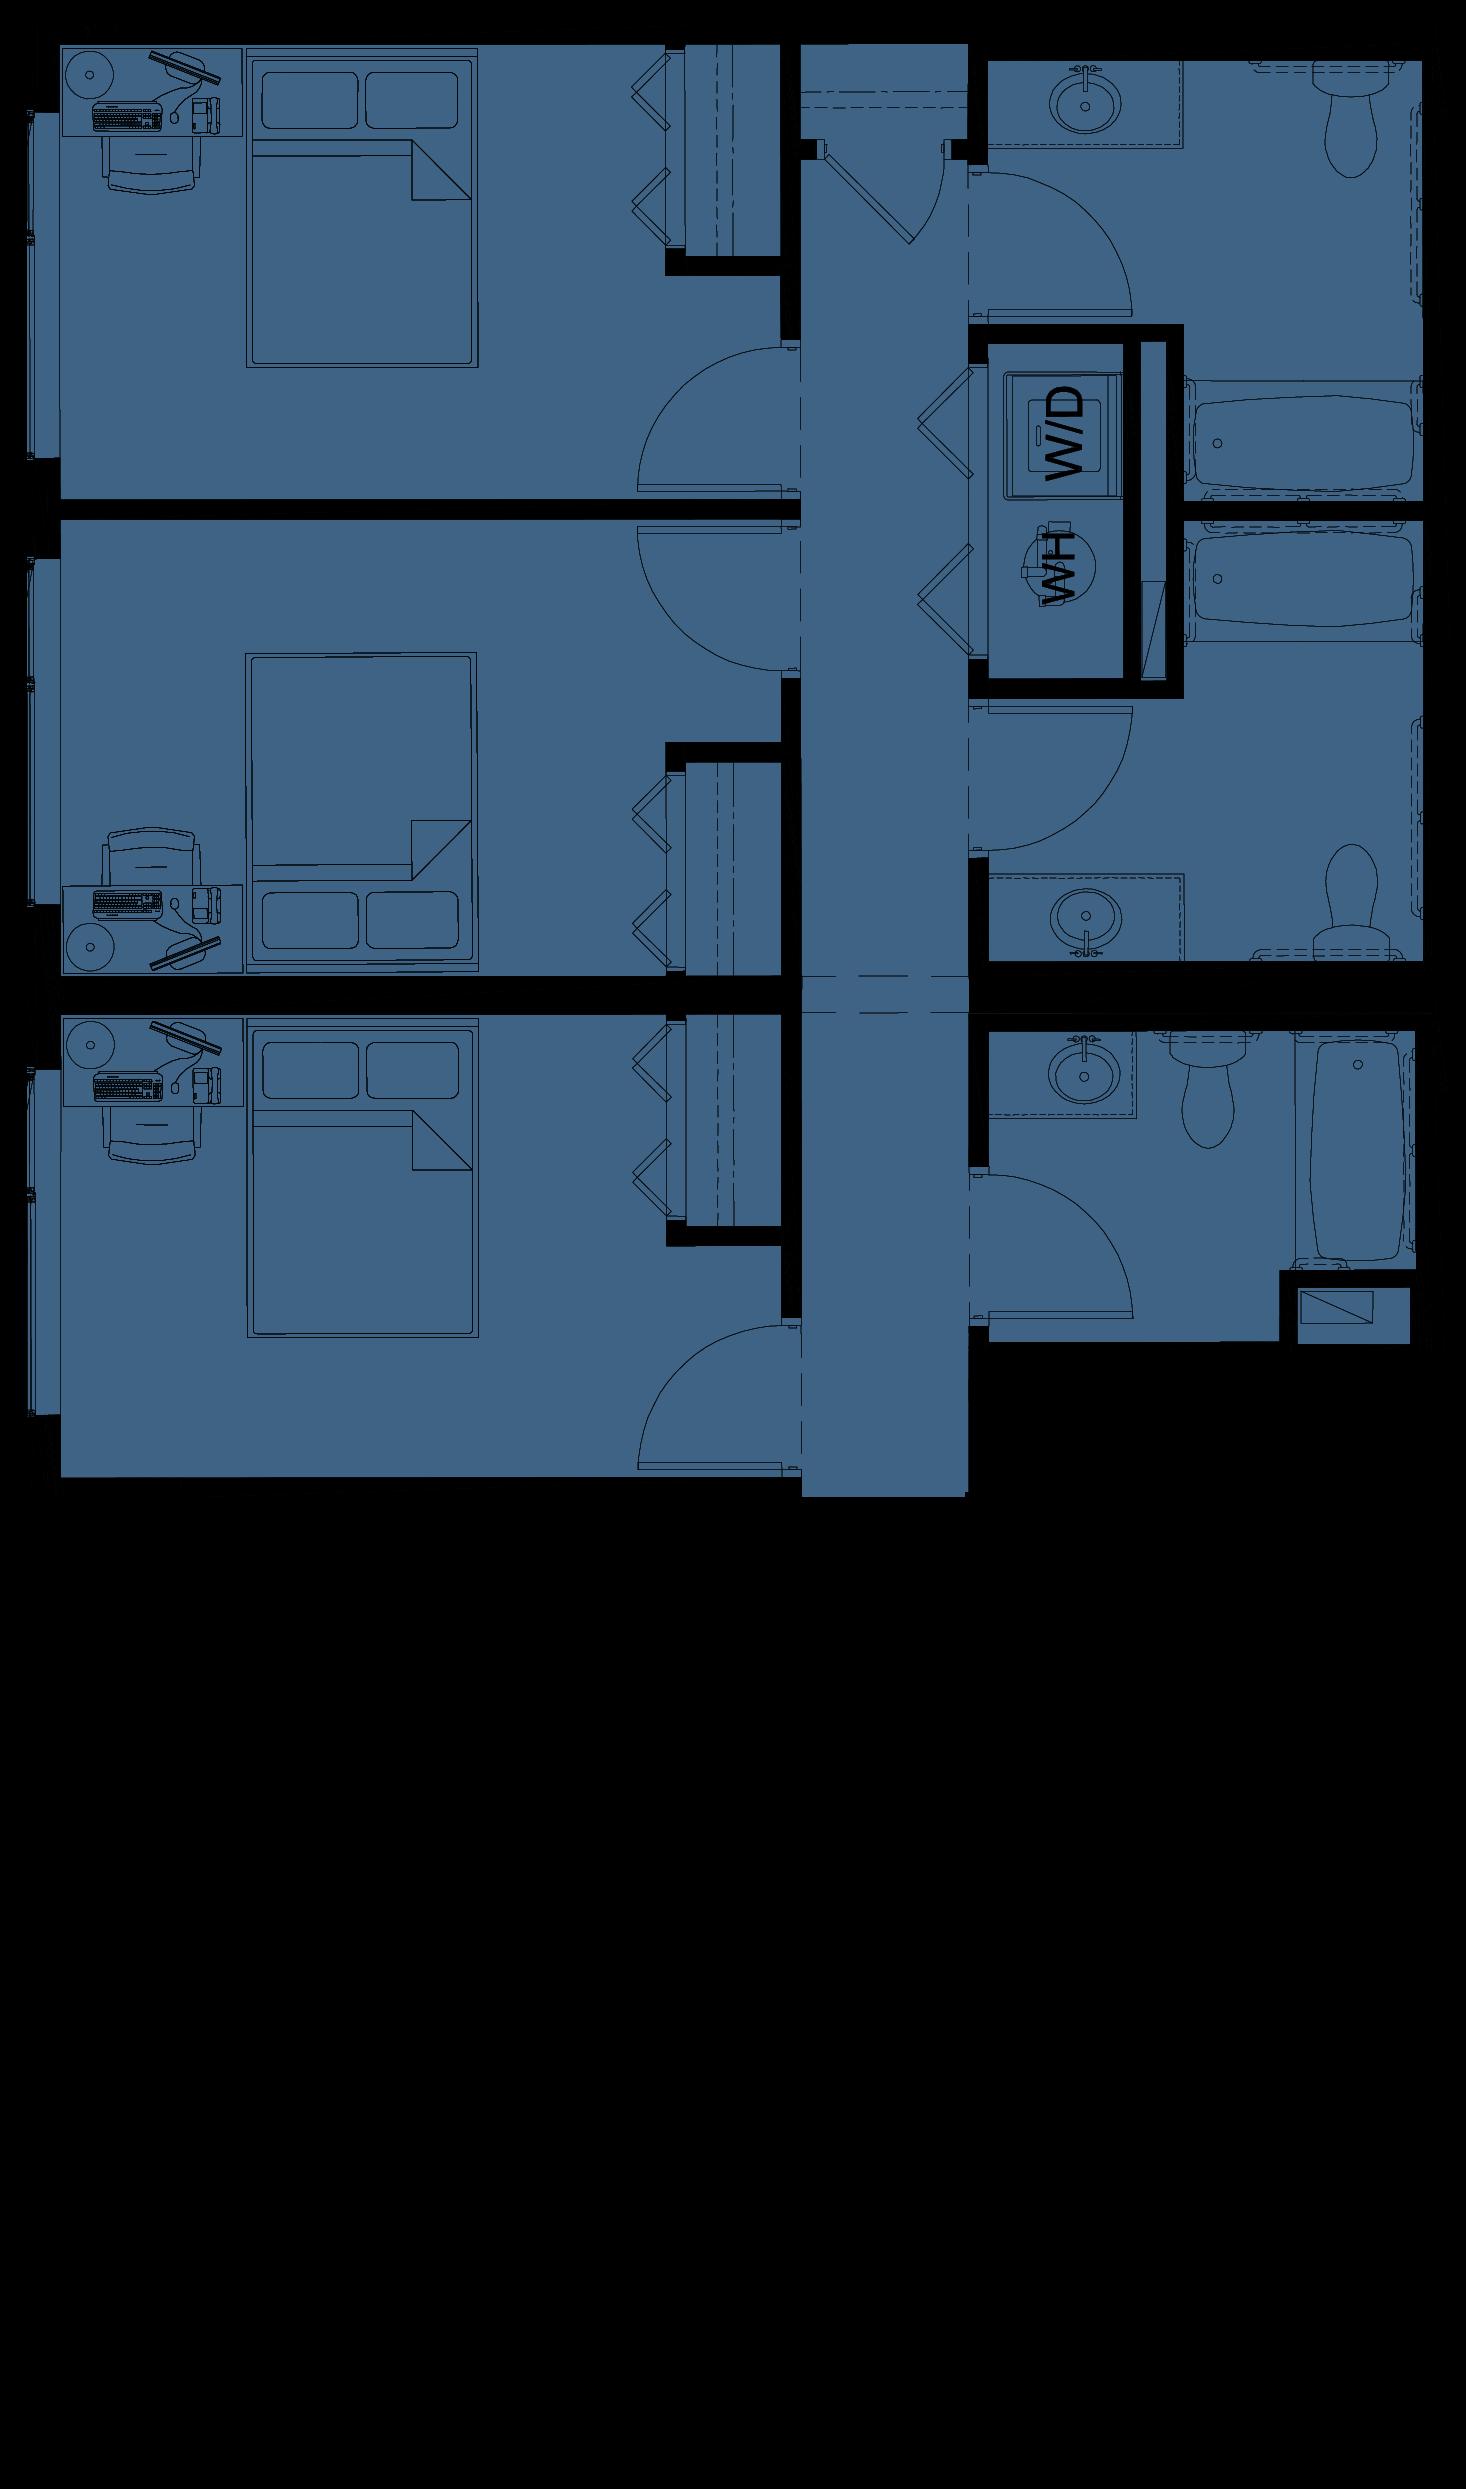 Floor Plan Image | Sapphire 2